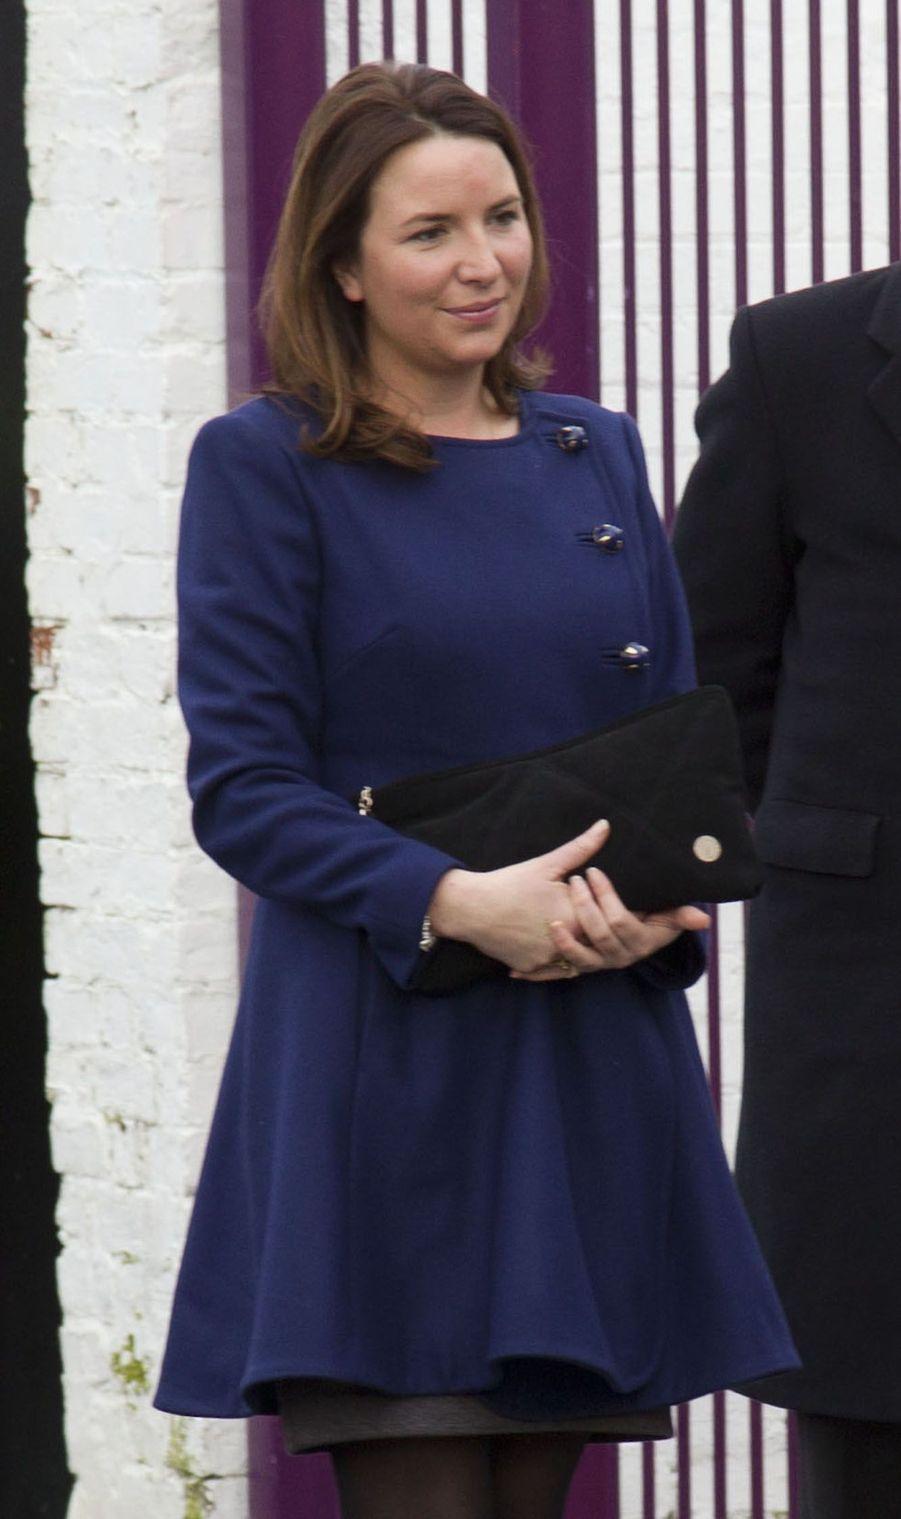 Rebecca Deacon, secrétaire privé de Kate